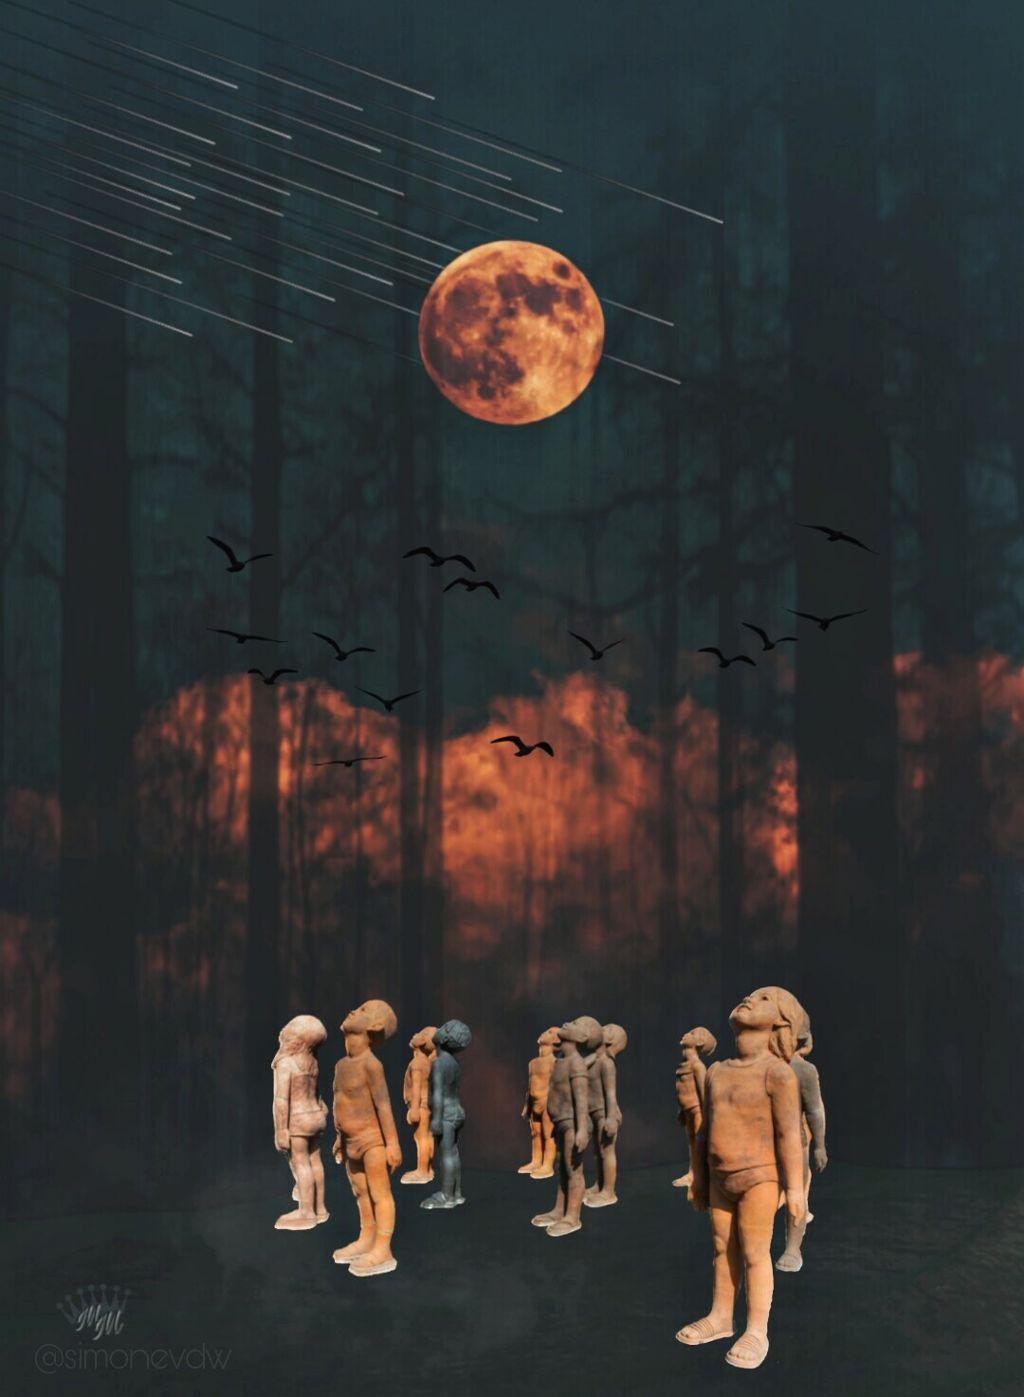 #editbyme #vipshoutout #moon #imagination #digitalart #art #artistic @rgr7